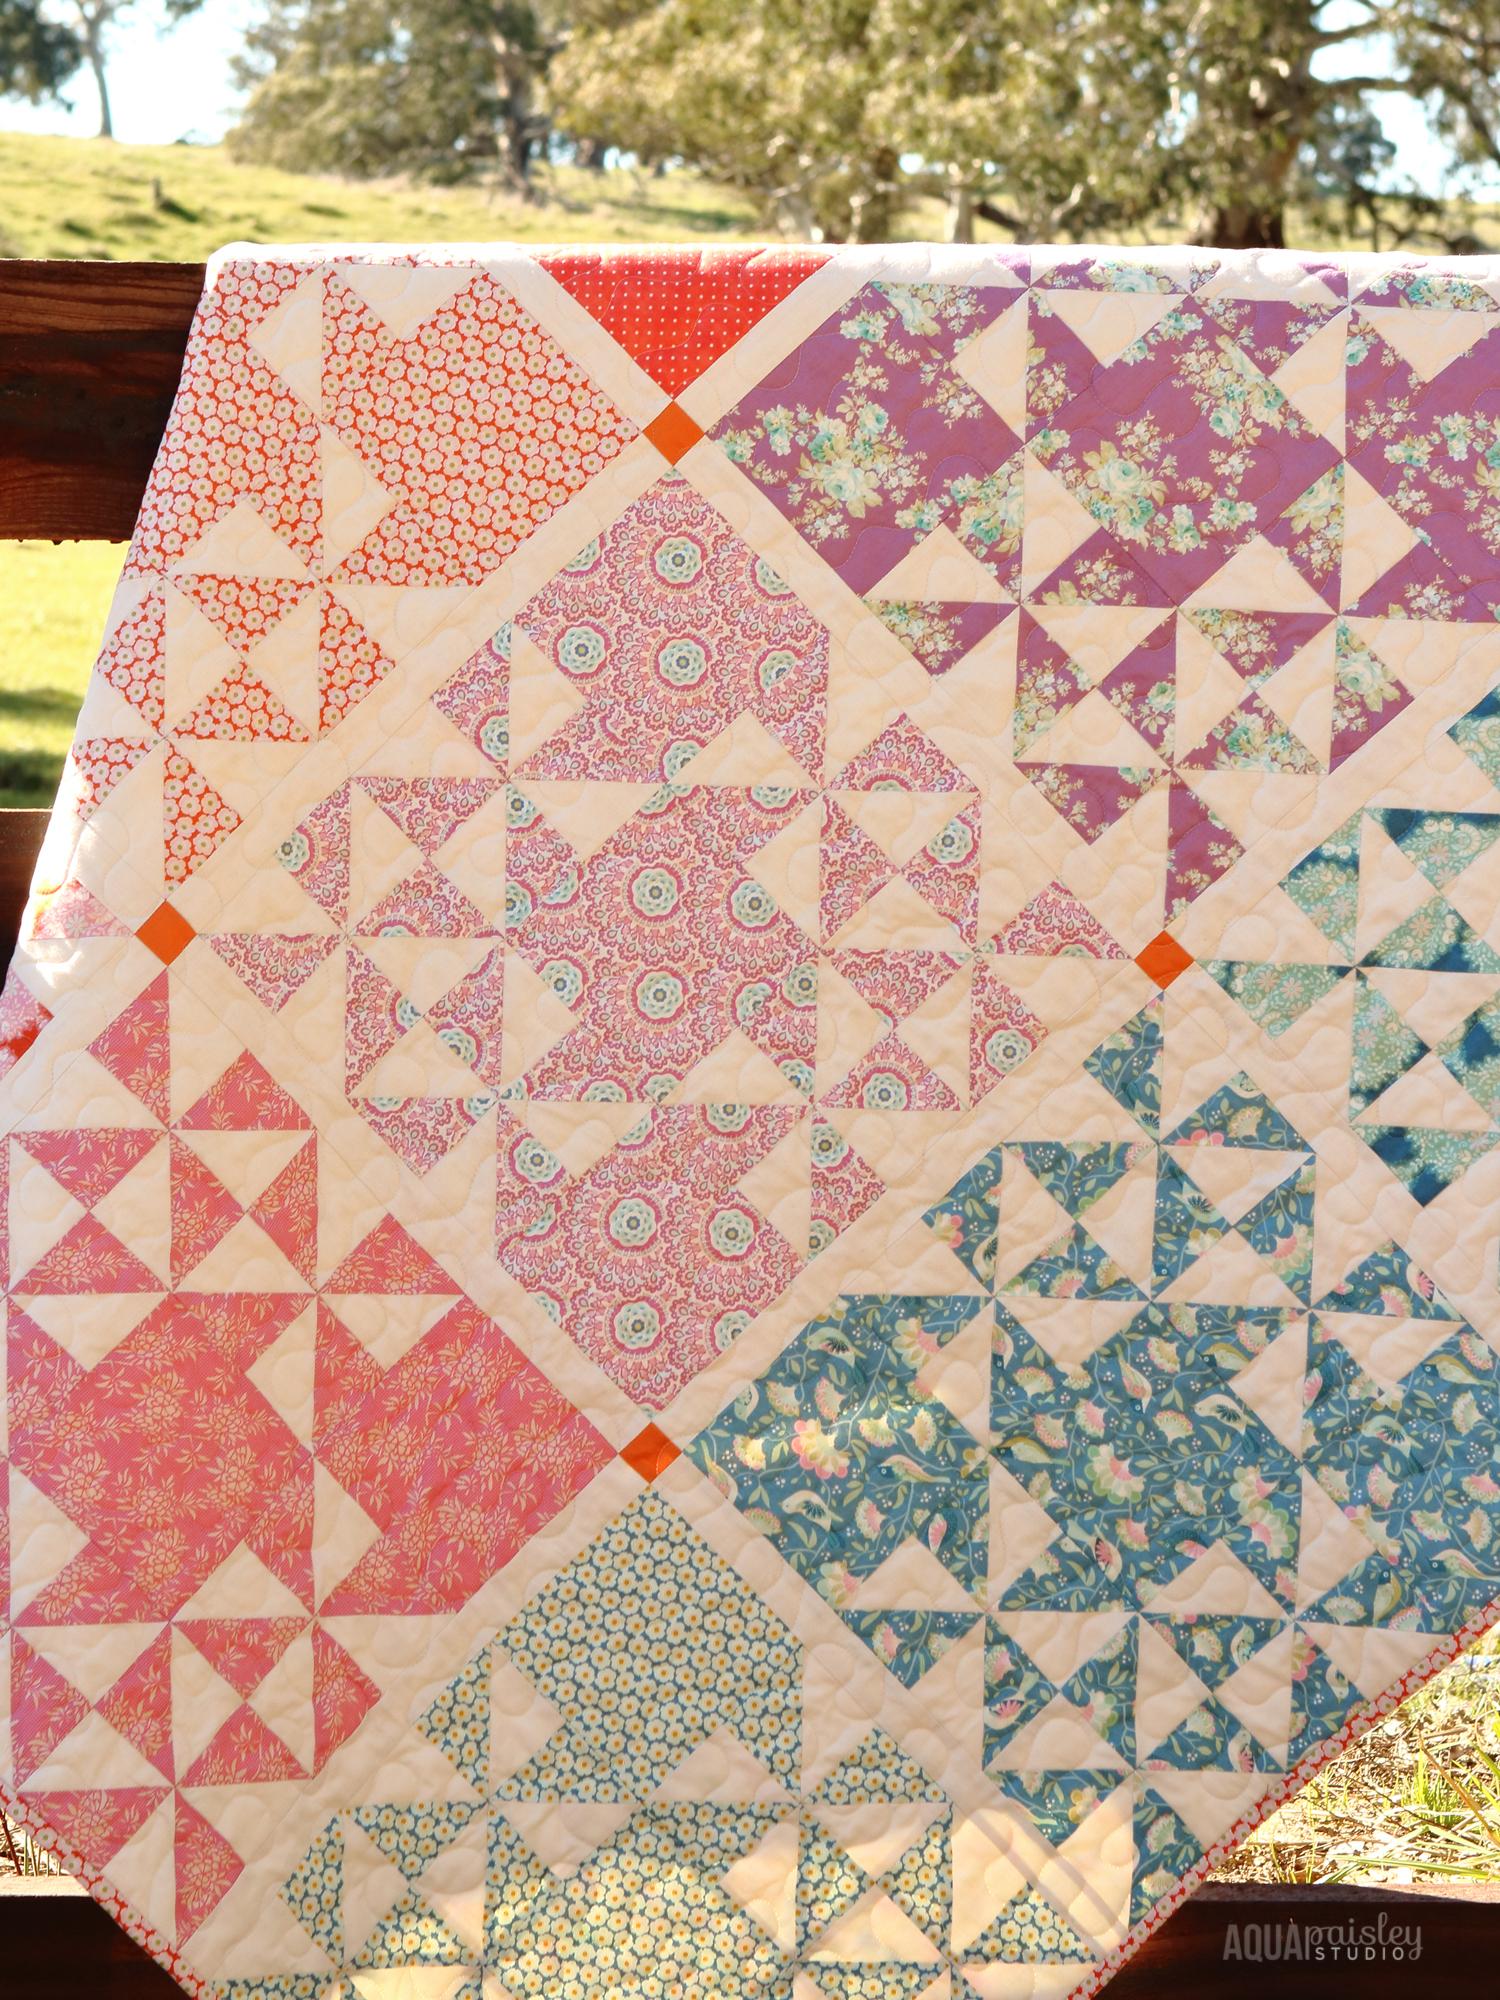 Gypsy Wife Quilt Spreadsheet Intended For Tilda Harvest Blog Hop  Harvest Market Quilt  Aqua Paisley Studio